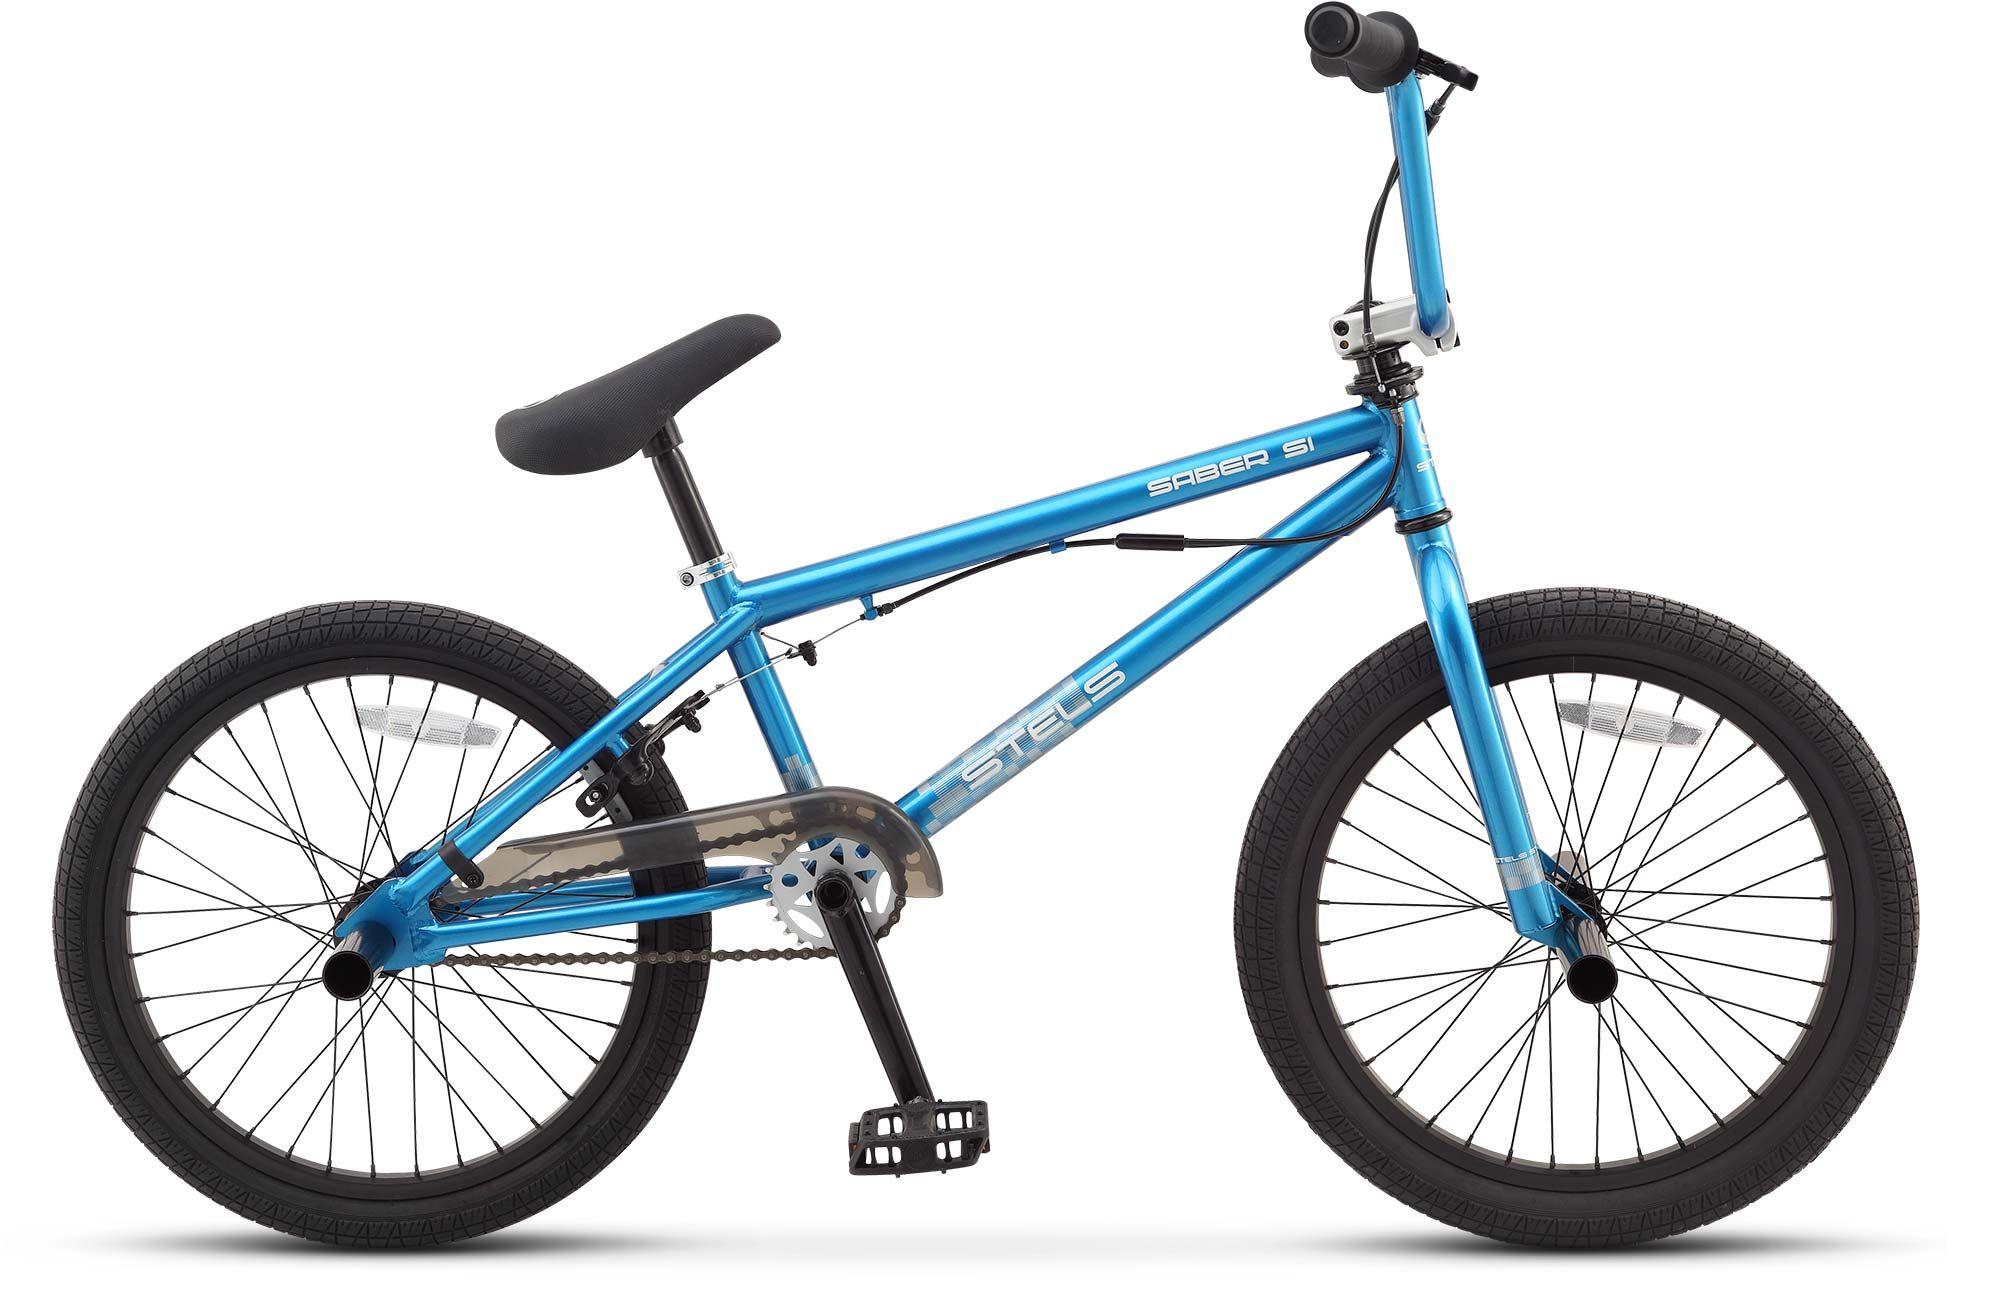 Велосипед Stels BMX Saber S1 2016,  трюковые  - артикул:262020